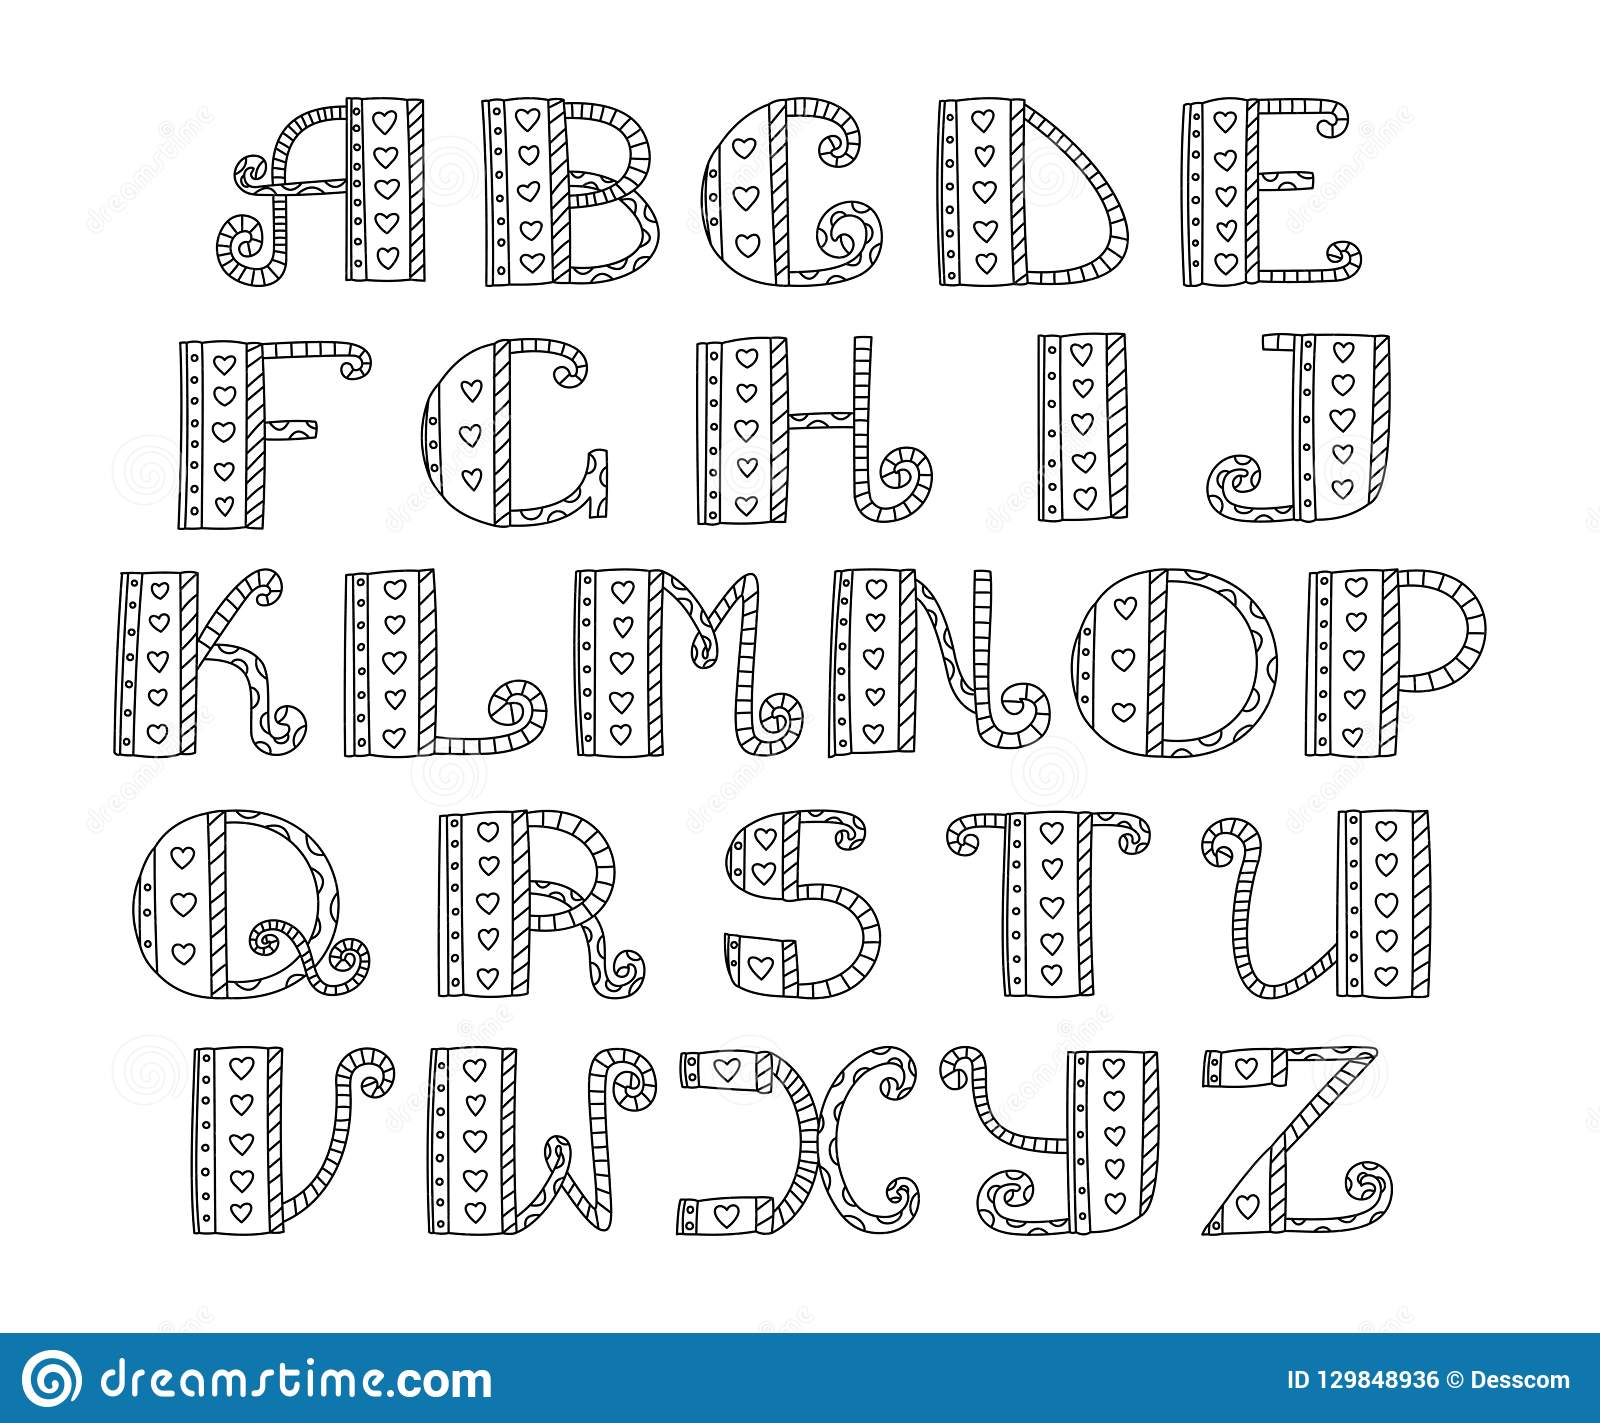 Abc Vector Hand Drawn Alphabet Doodle Lettering